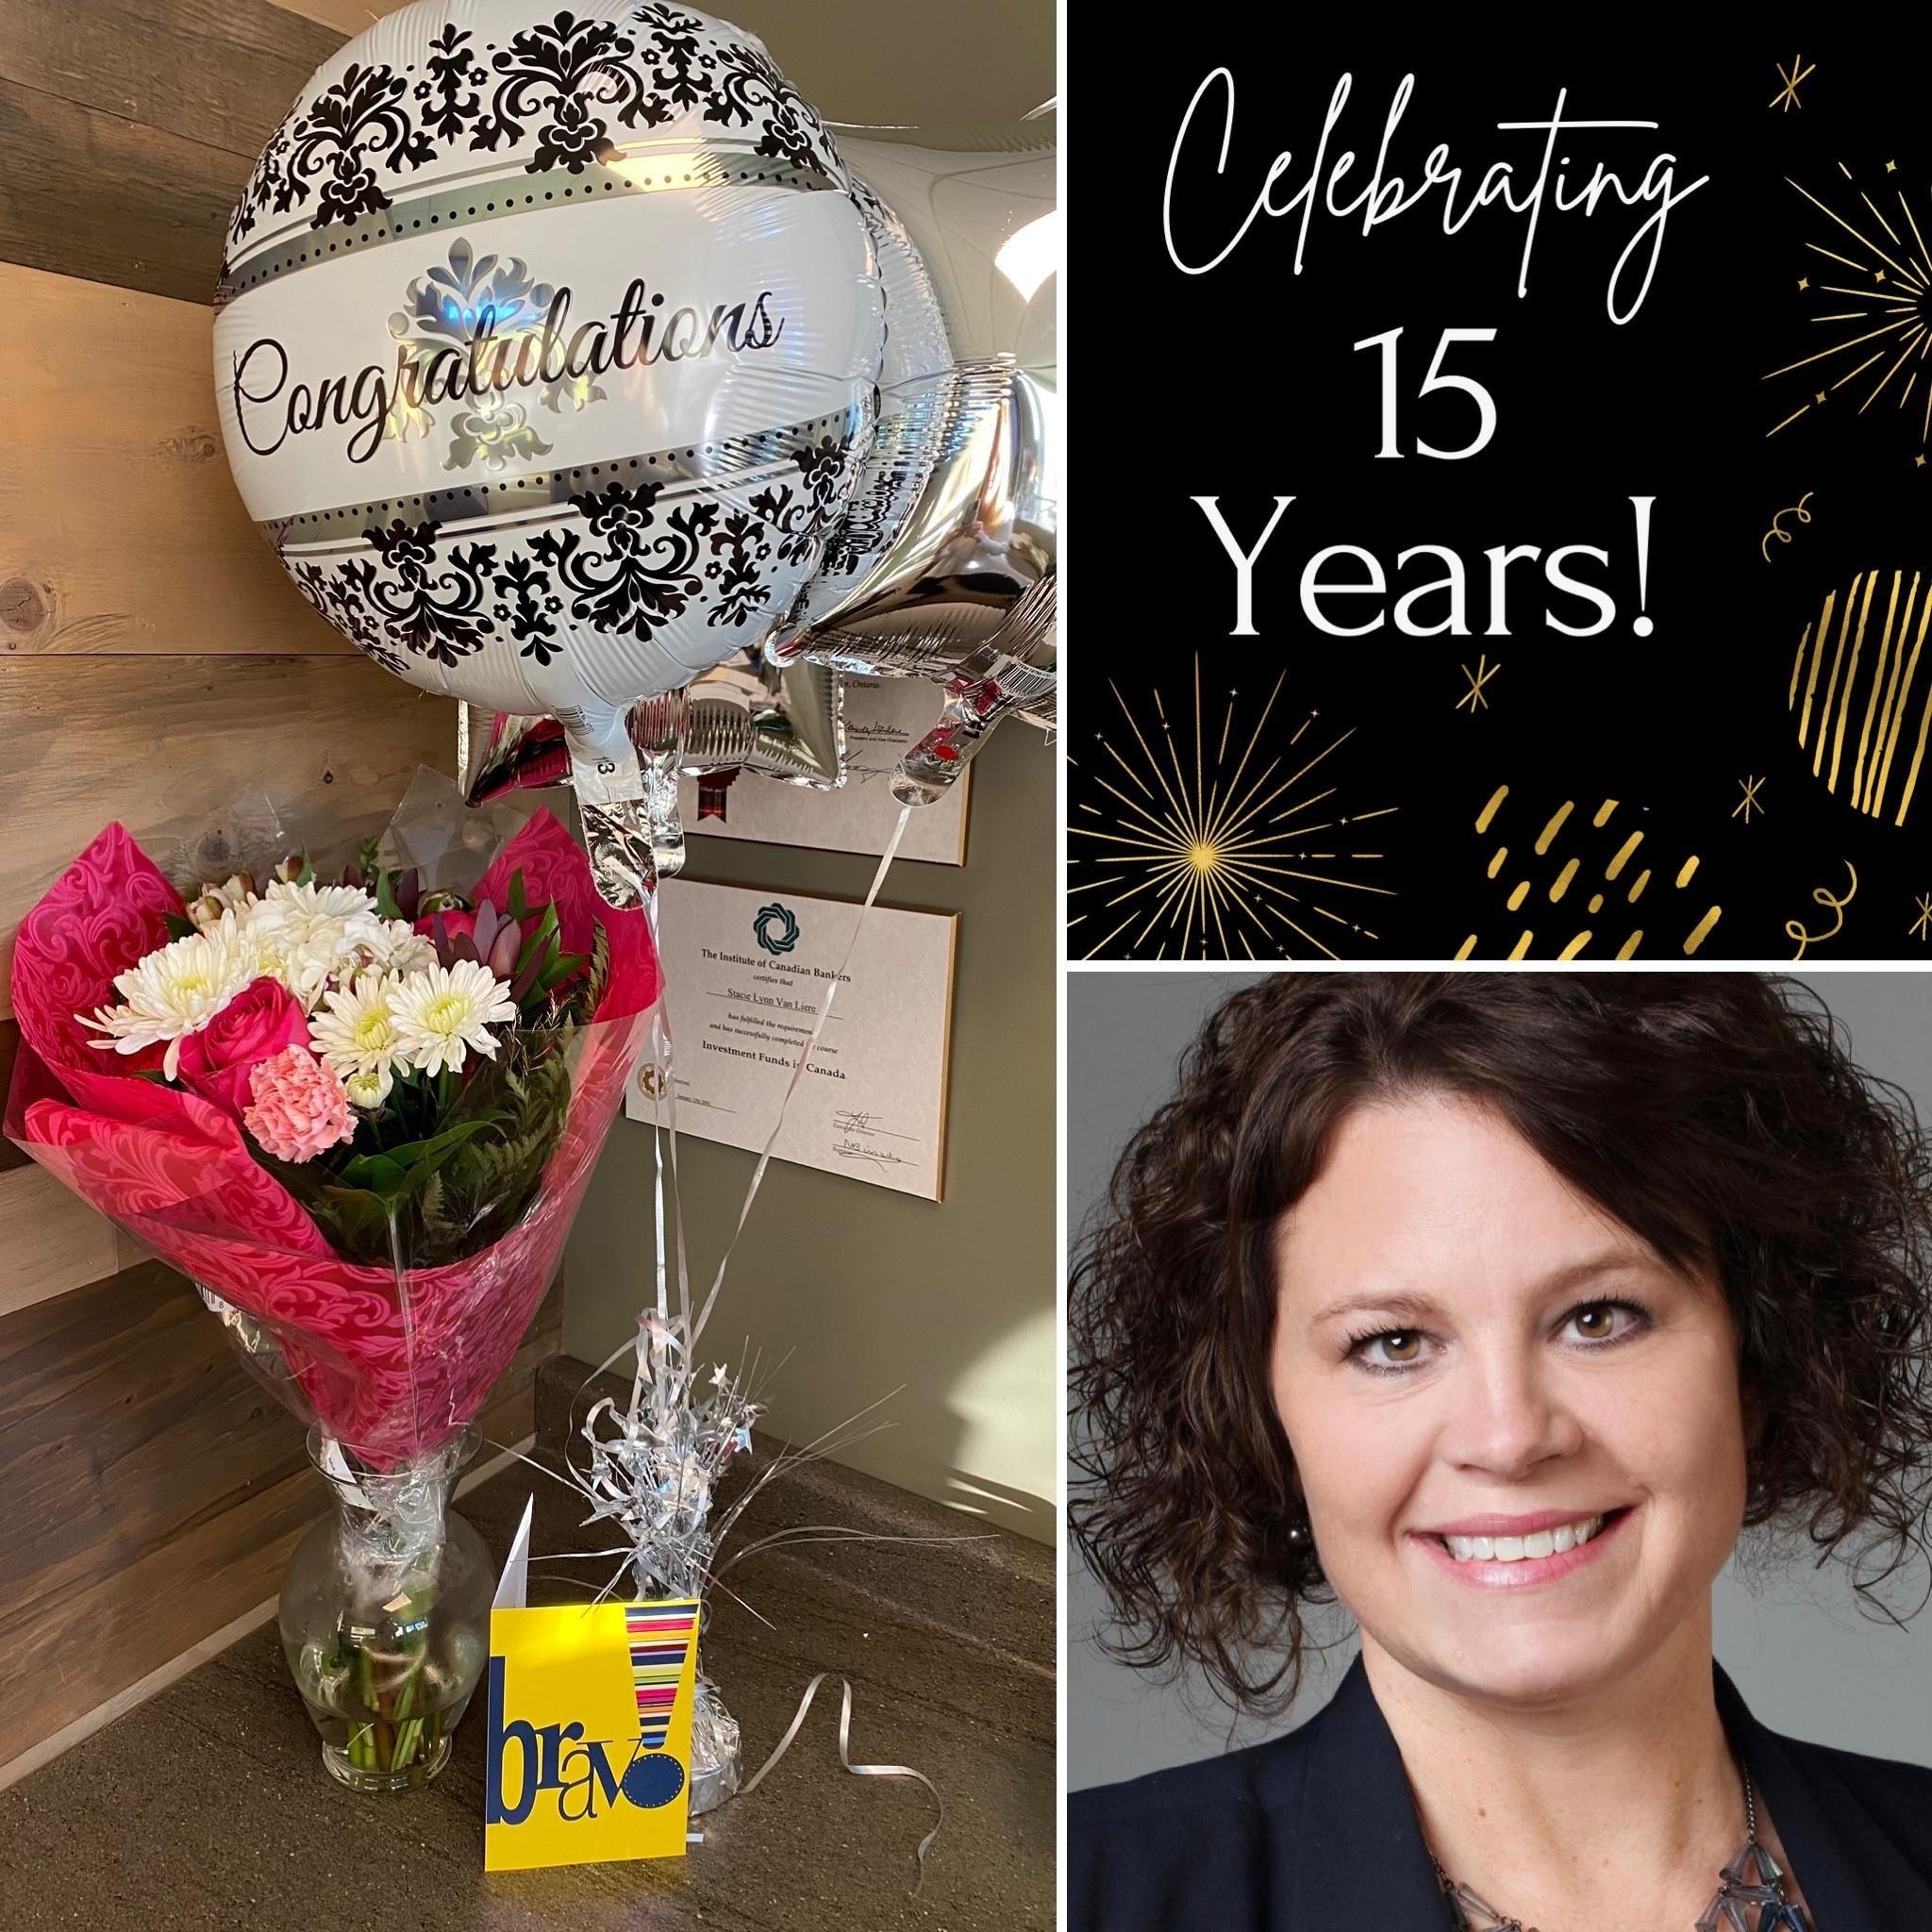 Stacie celebrates 15 years Thumbnail